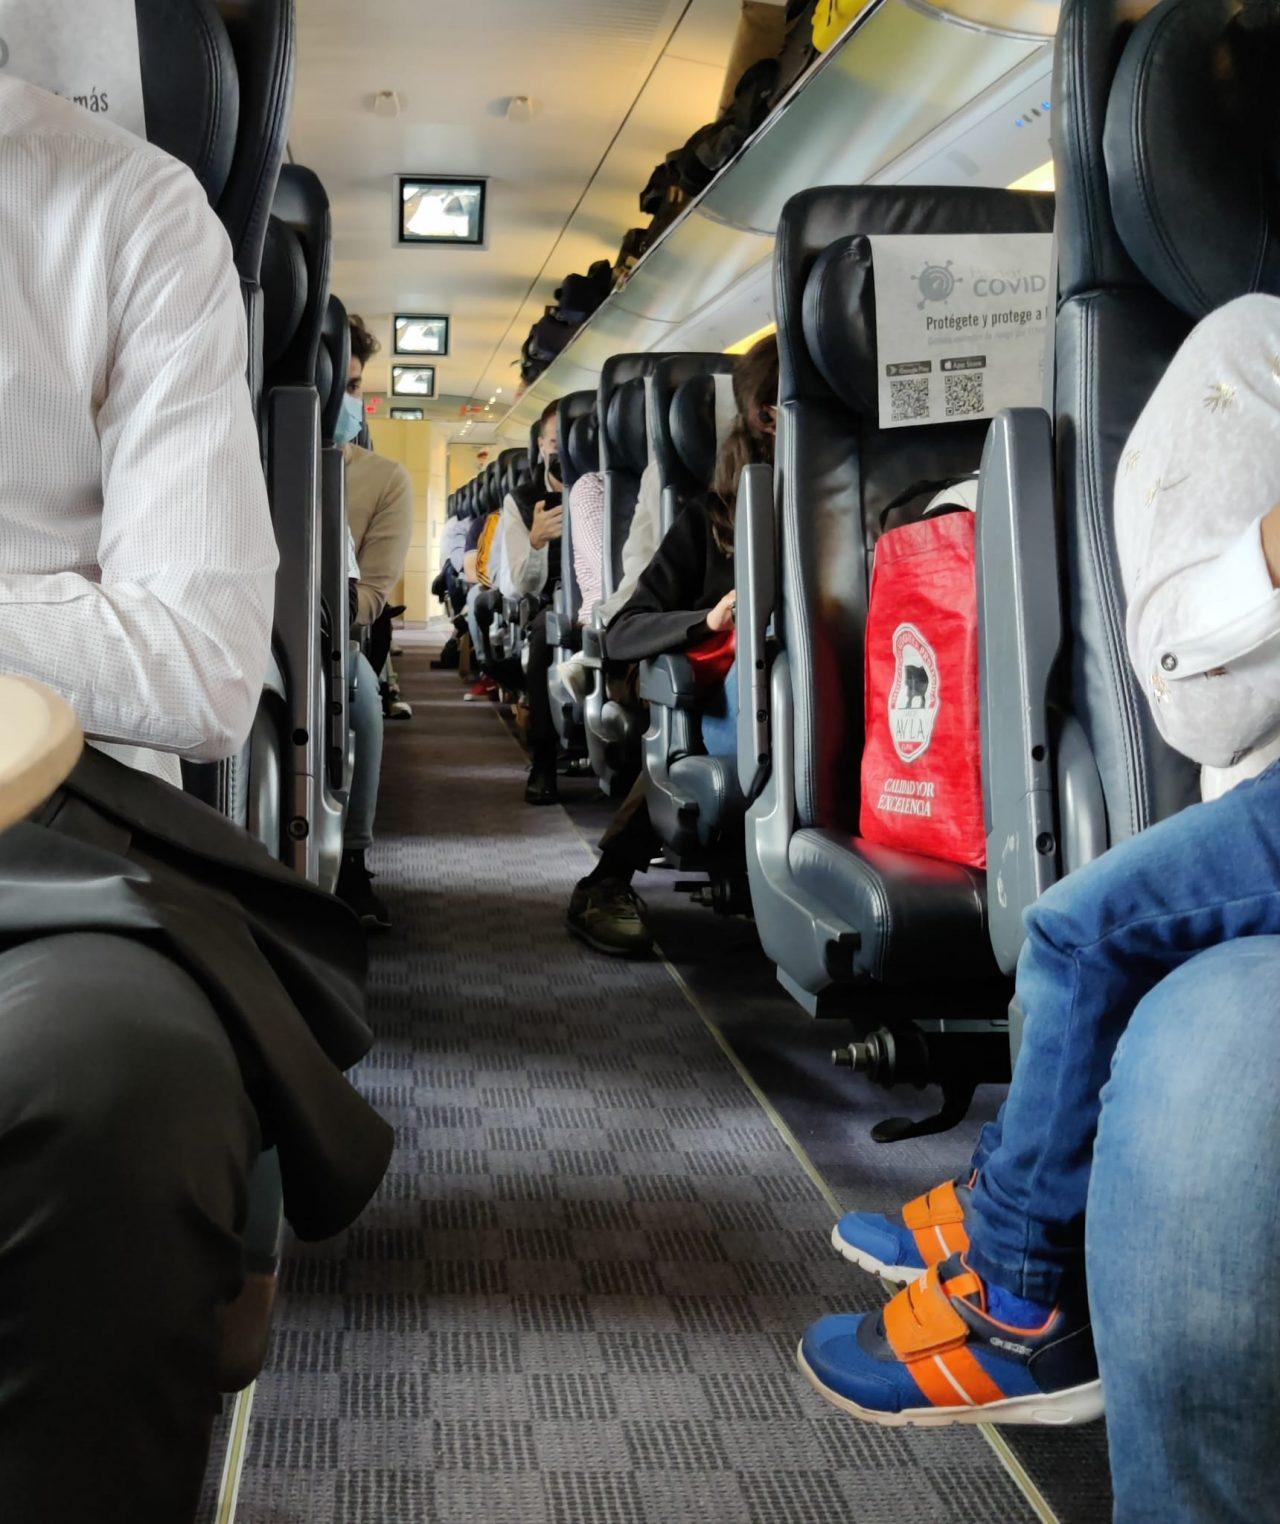 Tren-AVLO-Renfe-Viatge-1280x1524.jpg